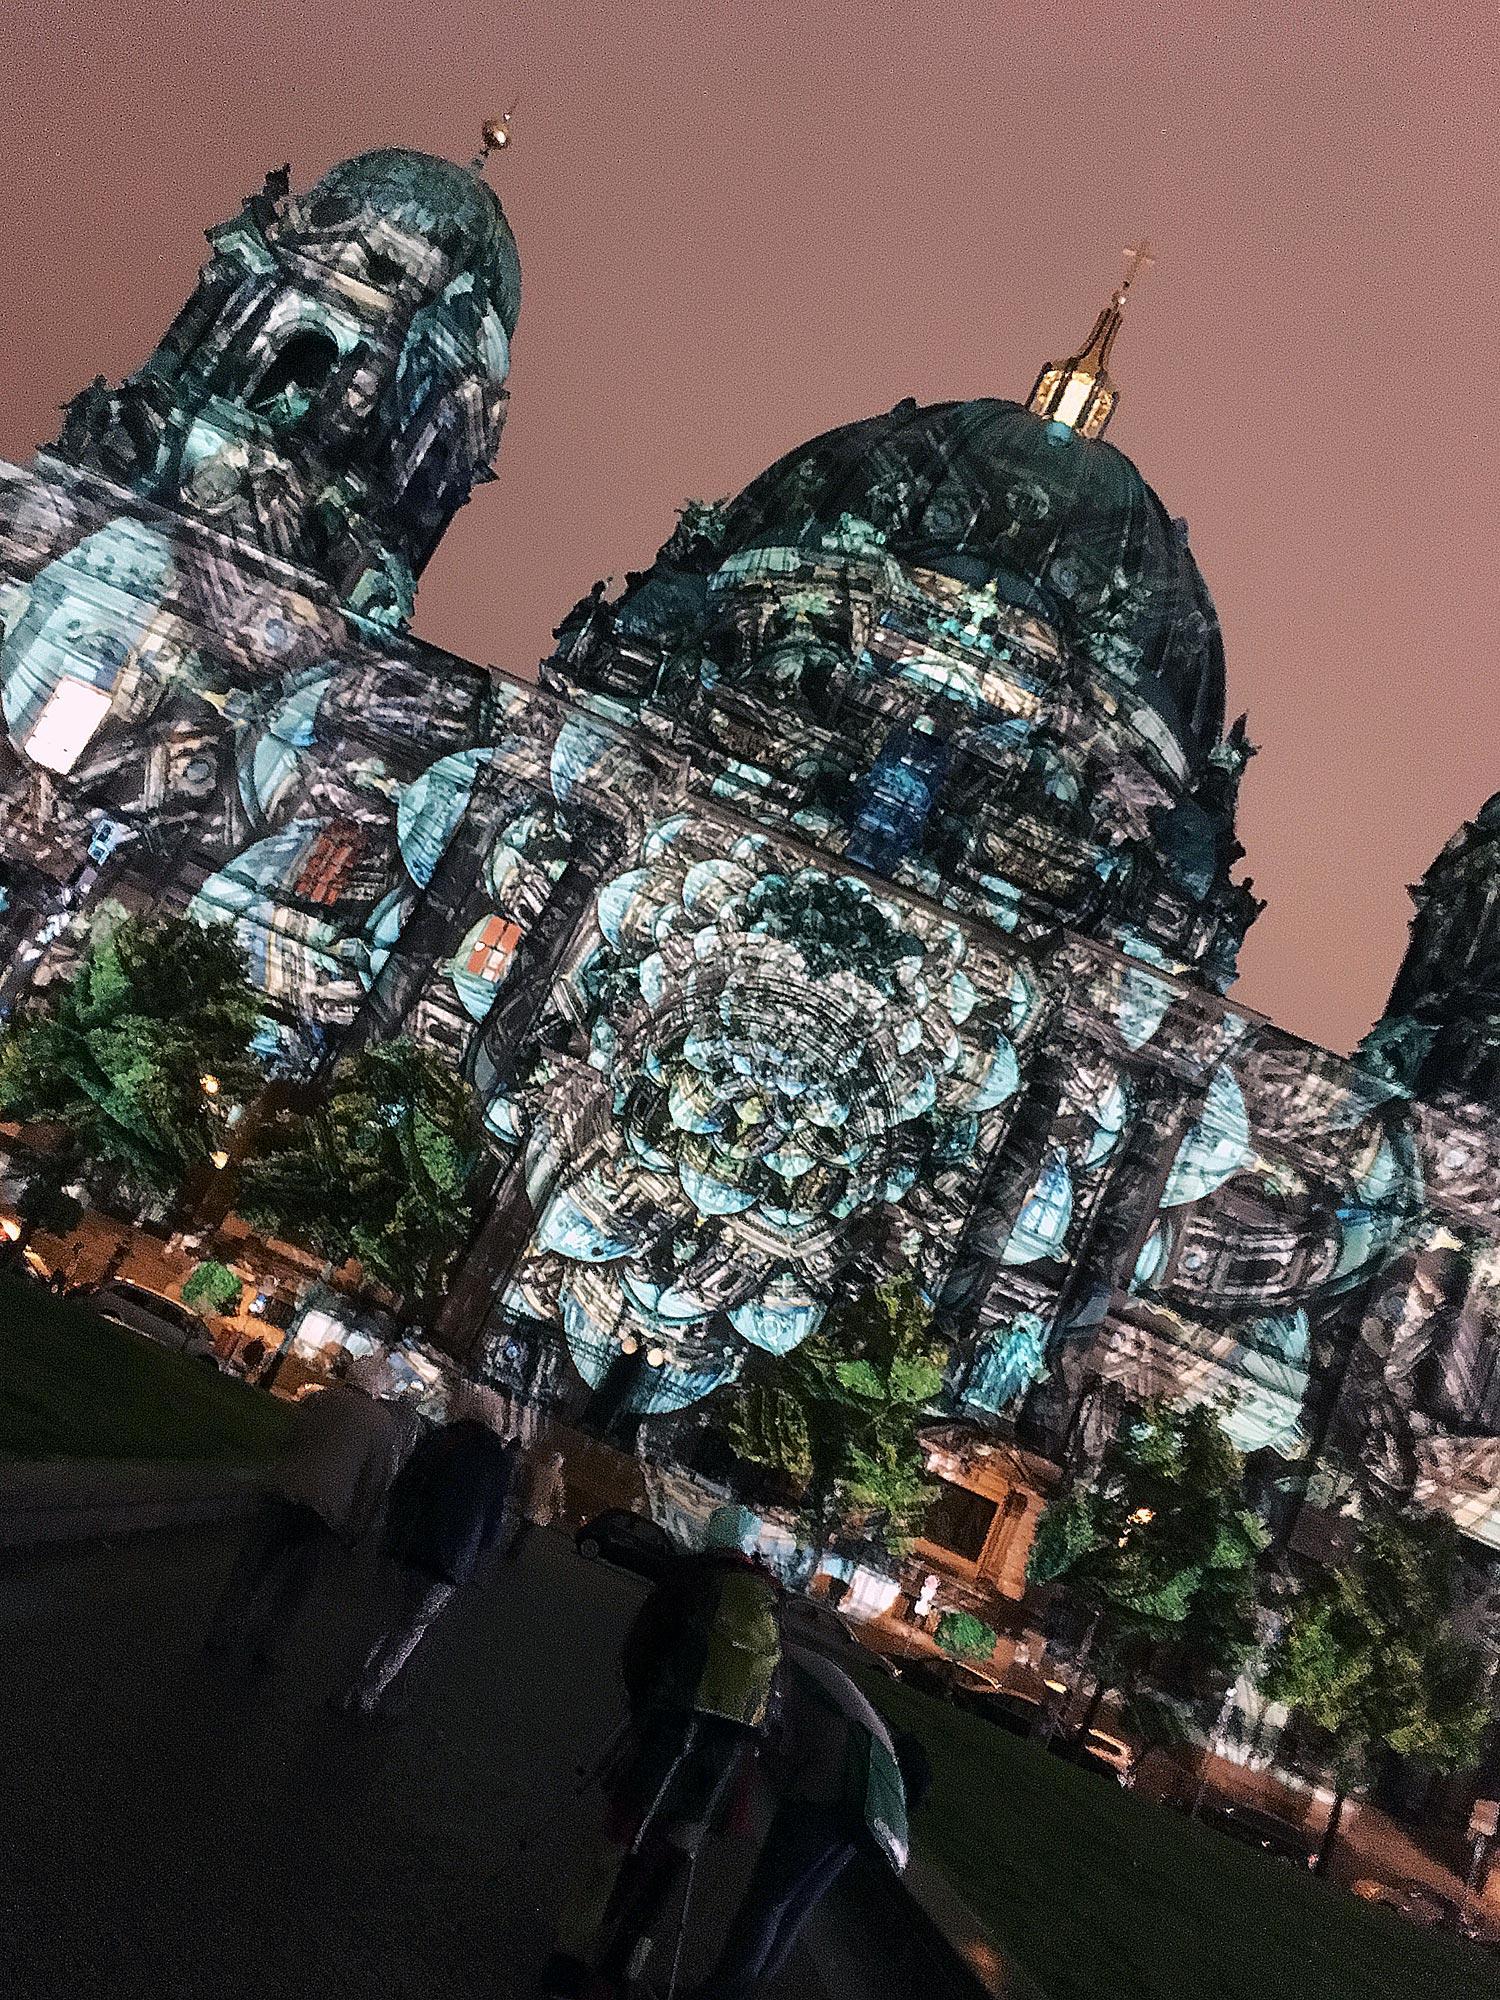 Festival of Lights 2016: Berliner Dom